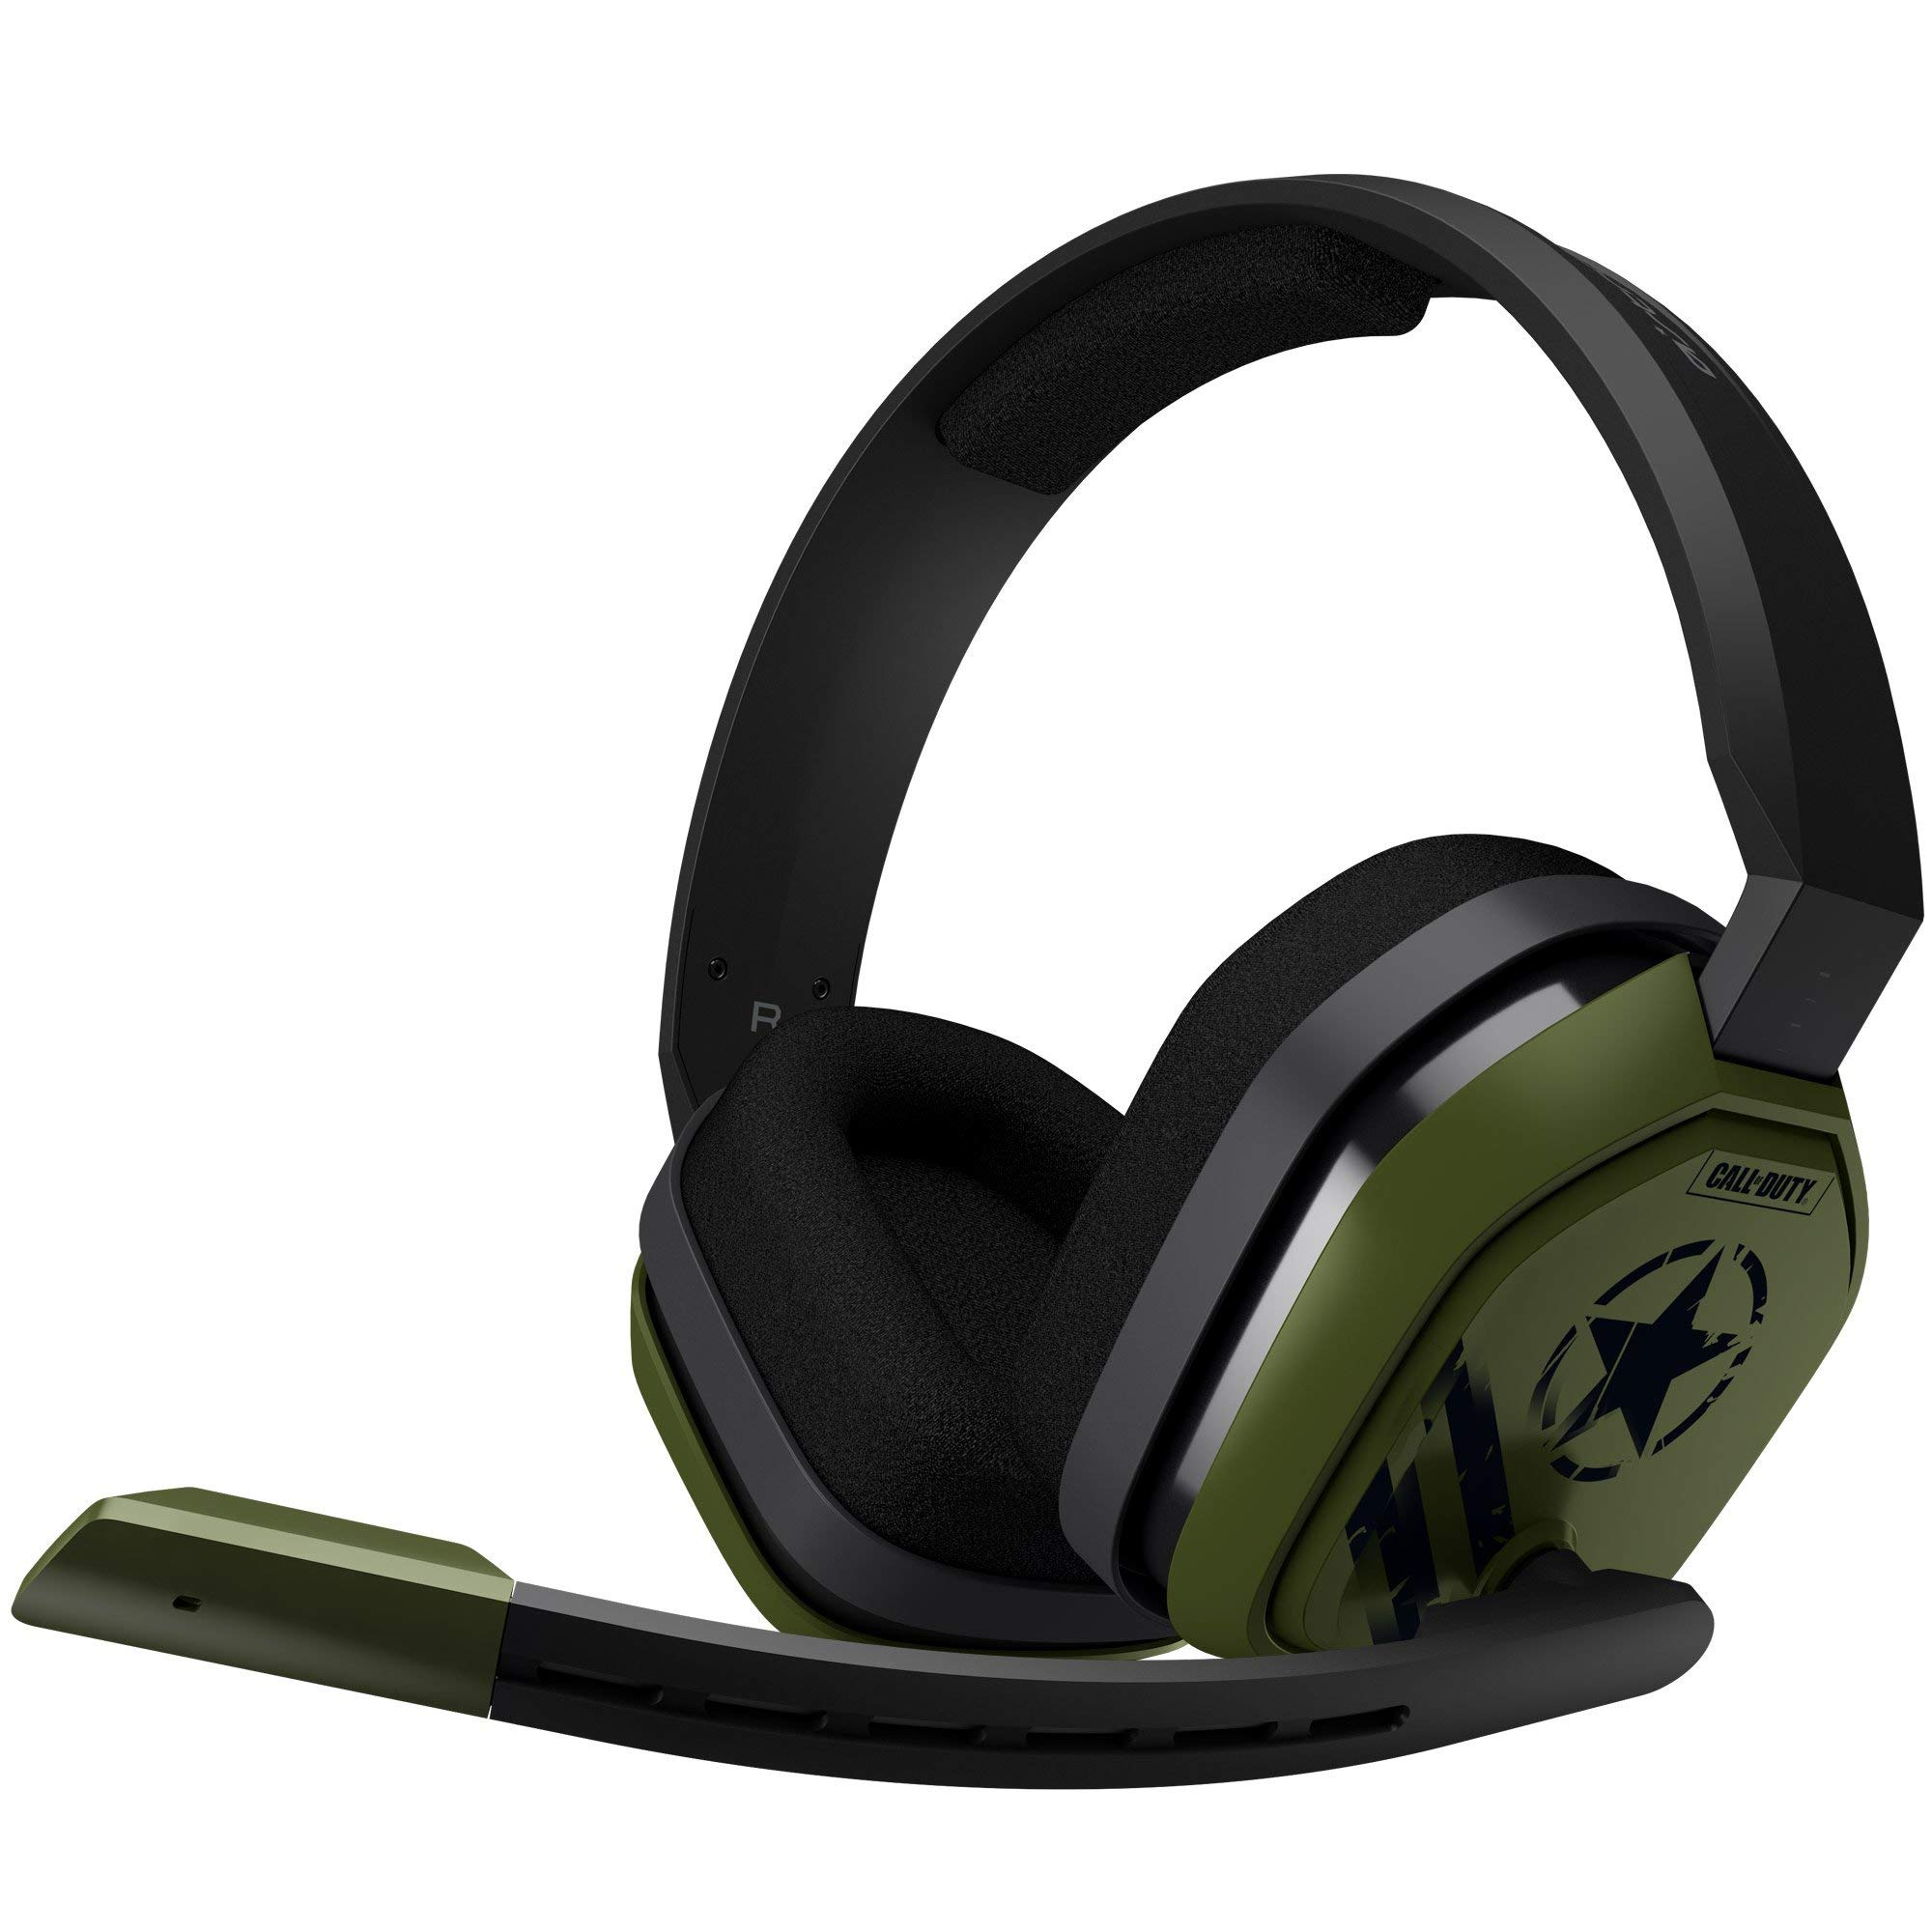 A10 Headset Call of Duty Edition - Black - 3.5 MM - N/A: Amazon.es ...